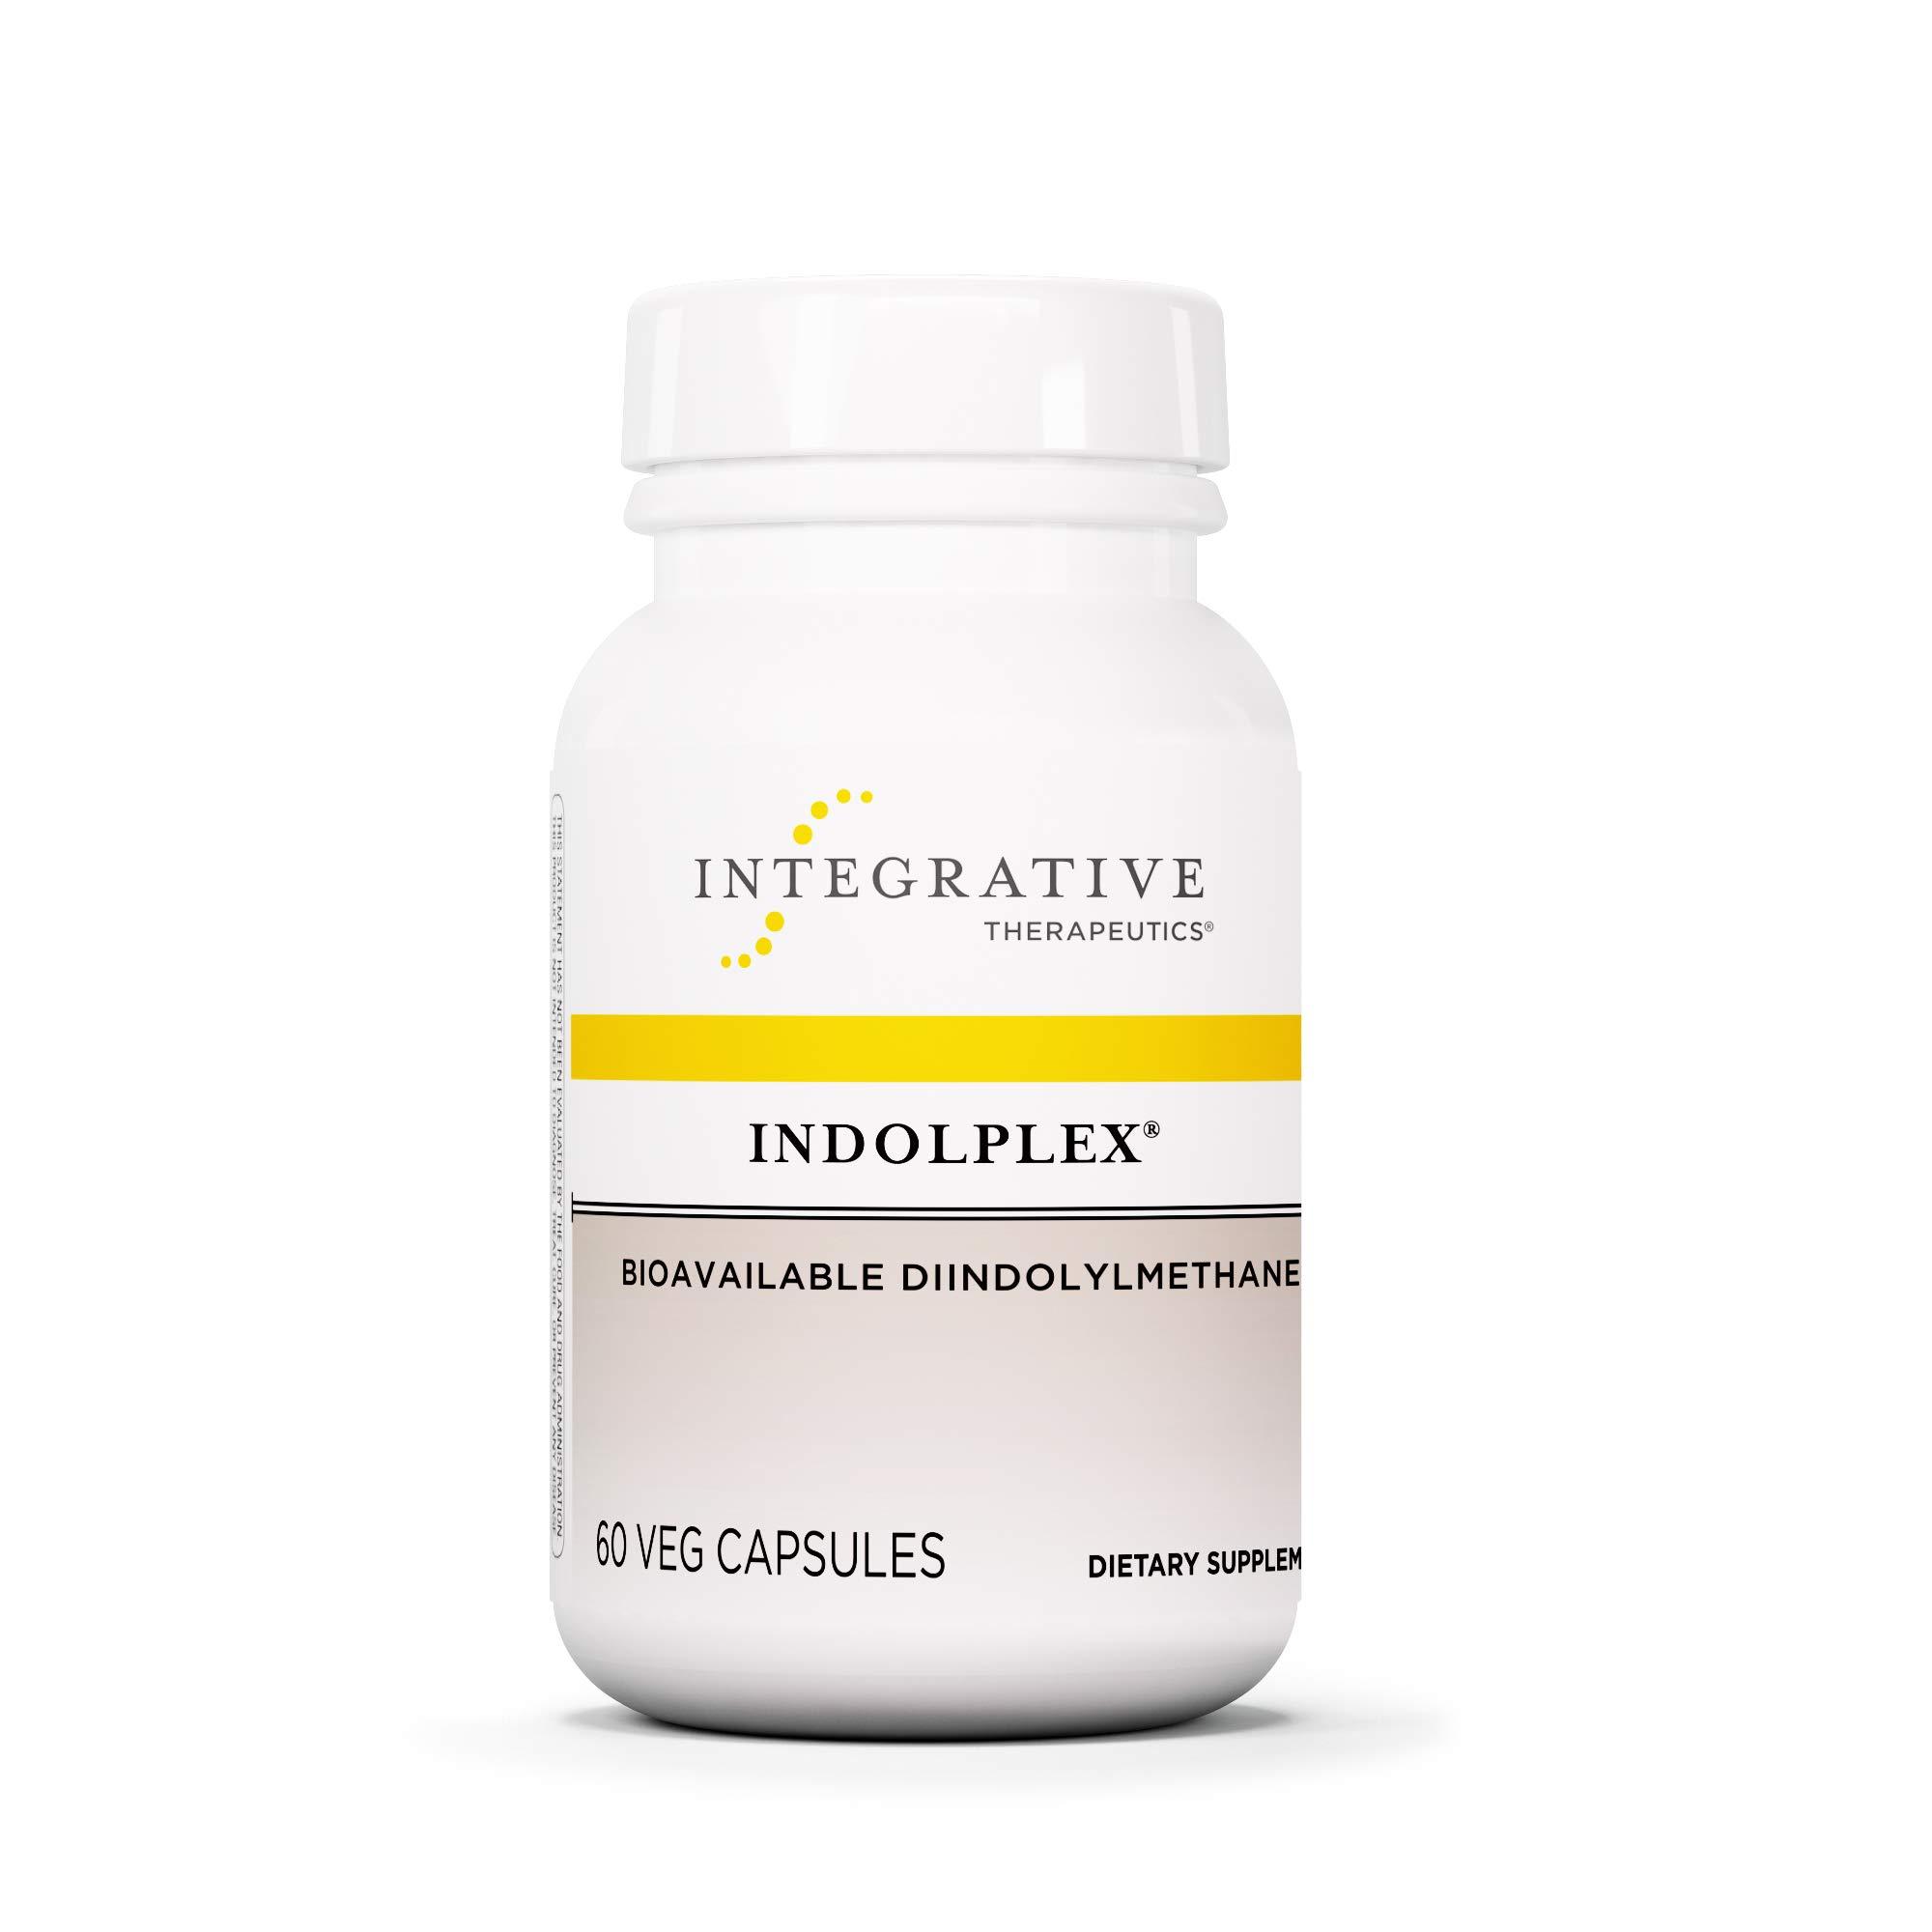 Integrative Therapeutics - Indolplex - Bioavailable DIM Supplement - Supports Healthy Estrogen Metabolism - 60 Capsules